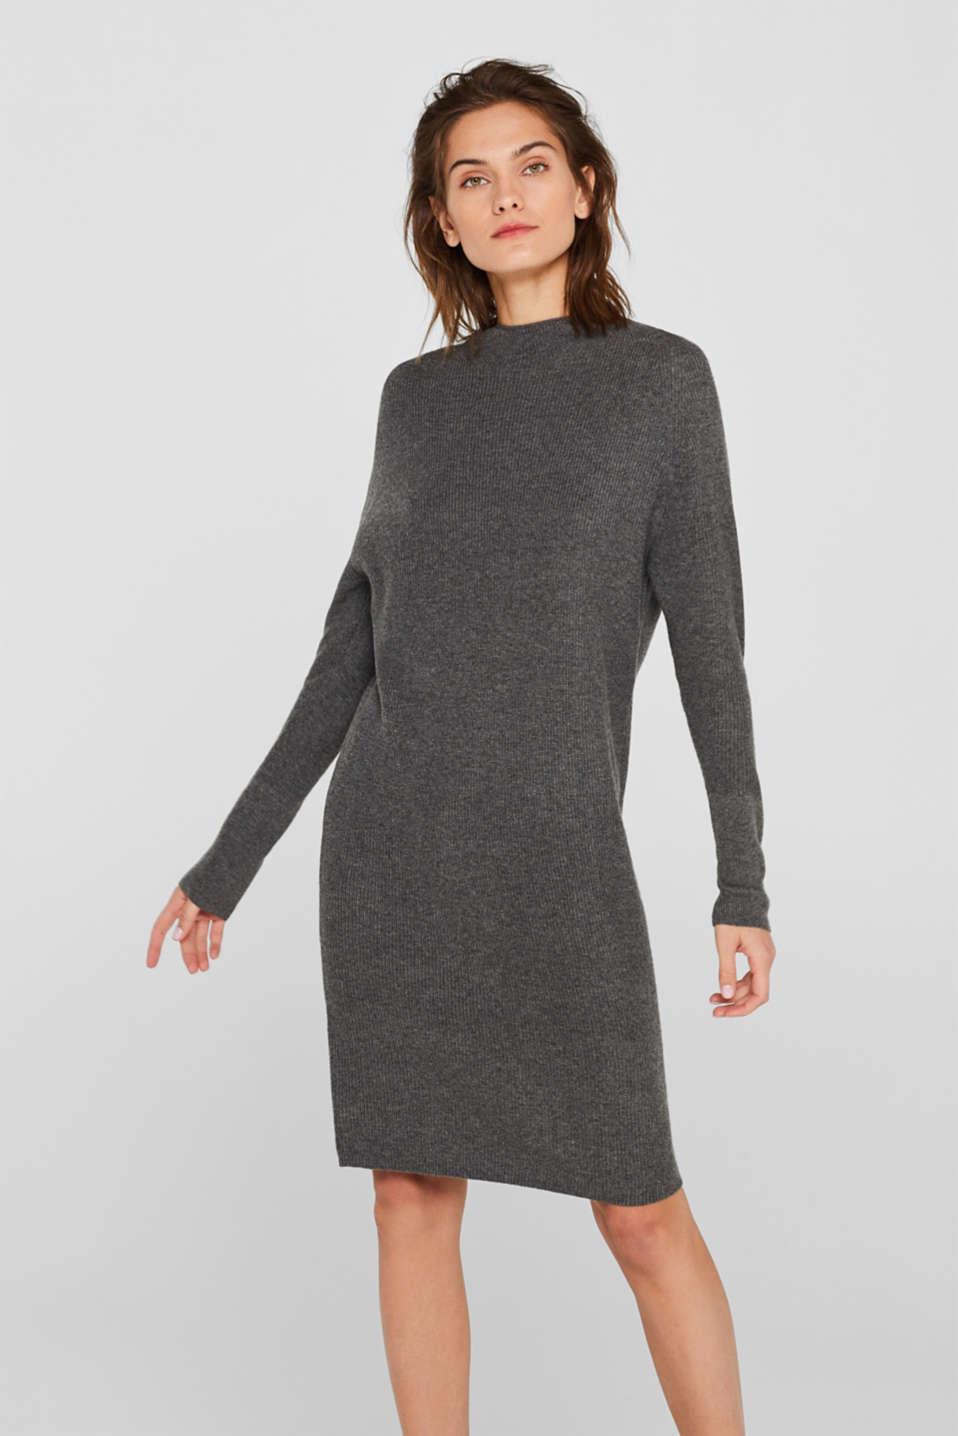 Dresses flat knitted, GUNMETAL 5, detail image number 0